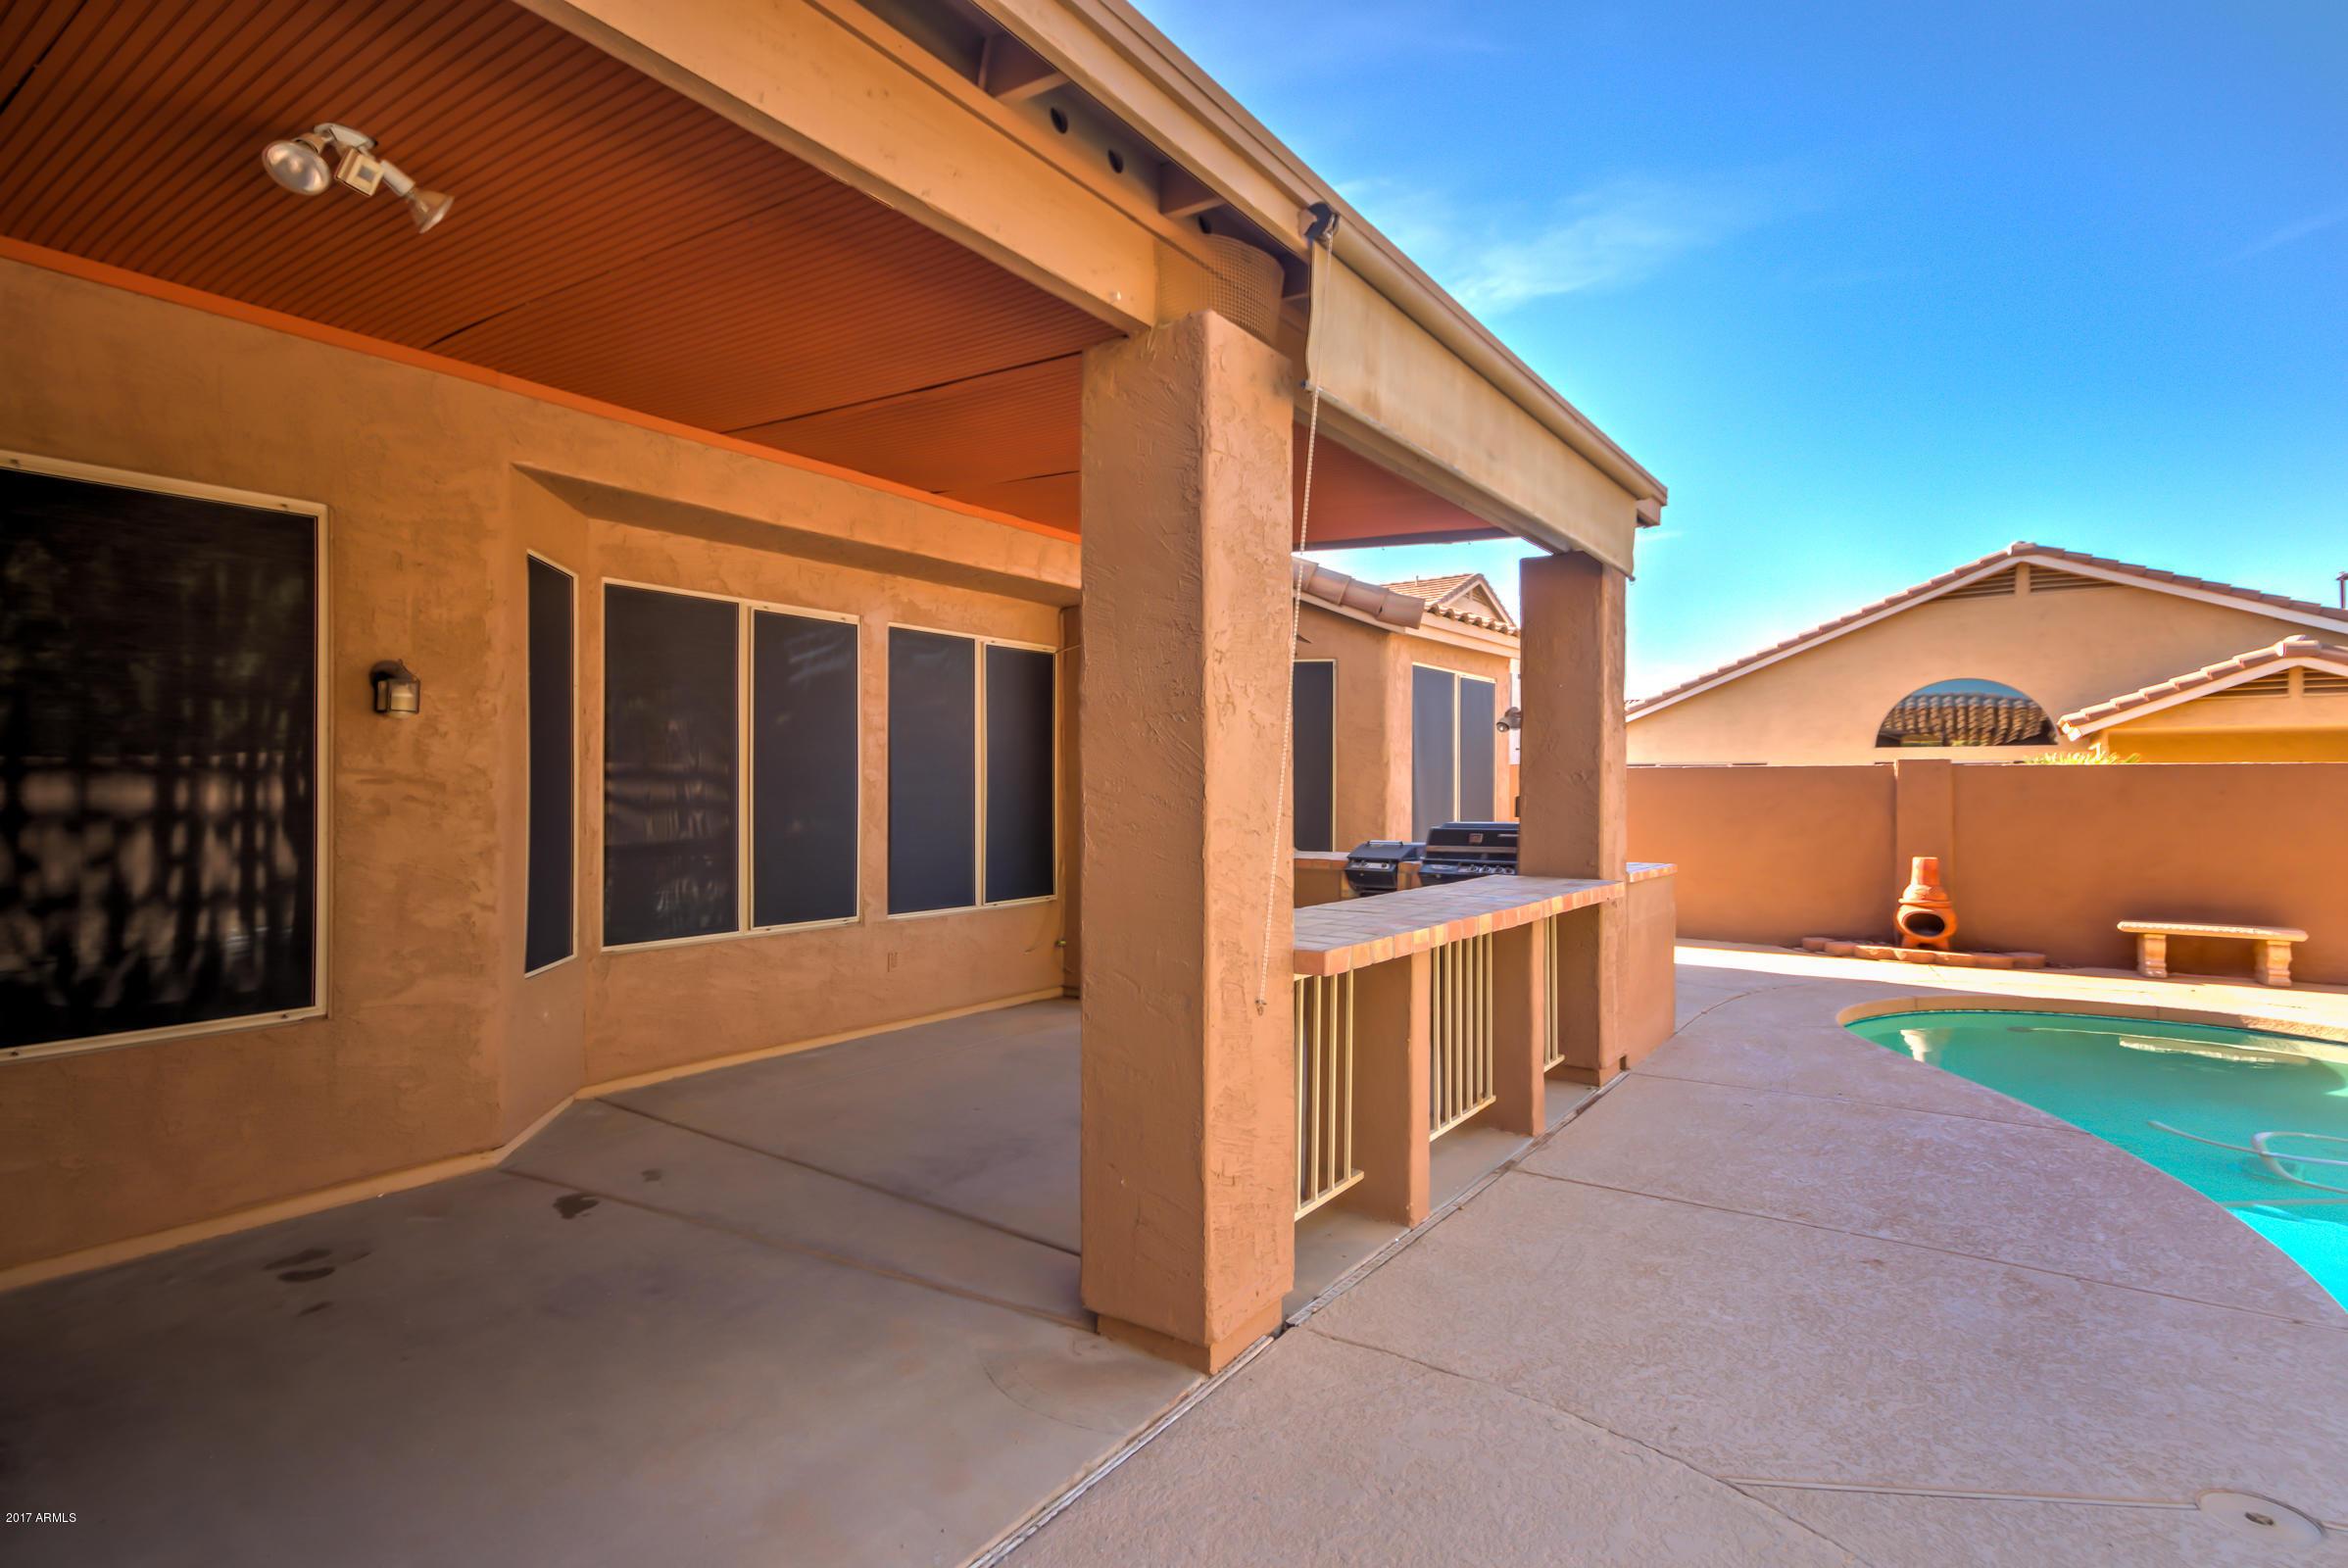 304 S Ironwood  Street Gilbert, AZ 85296 - img41